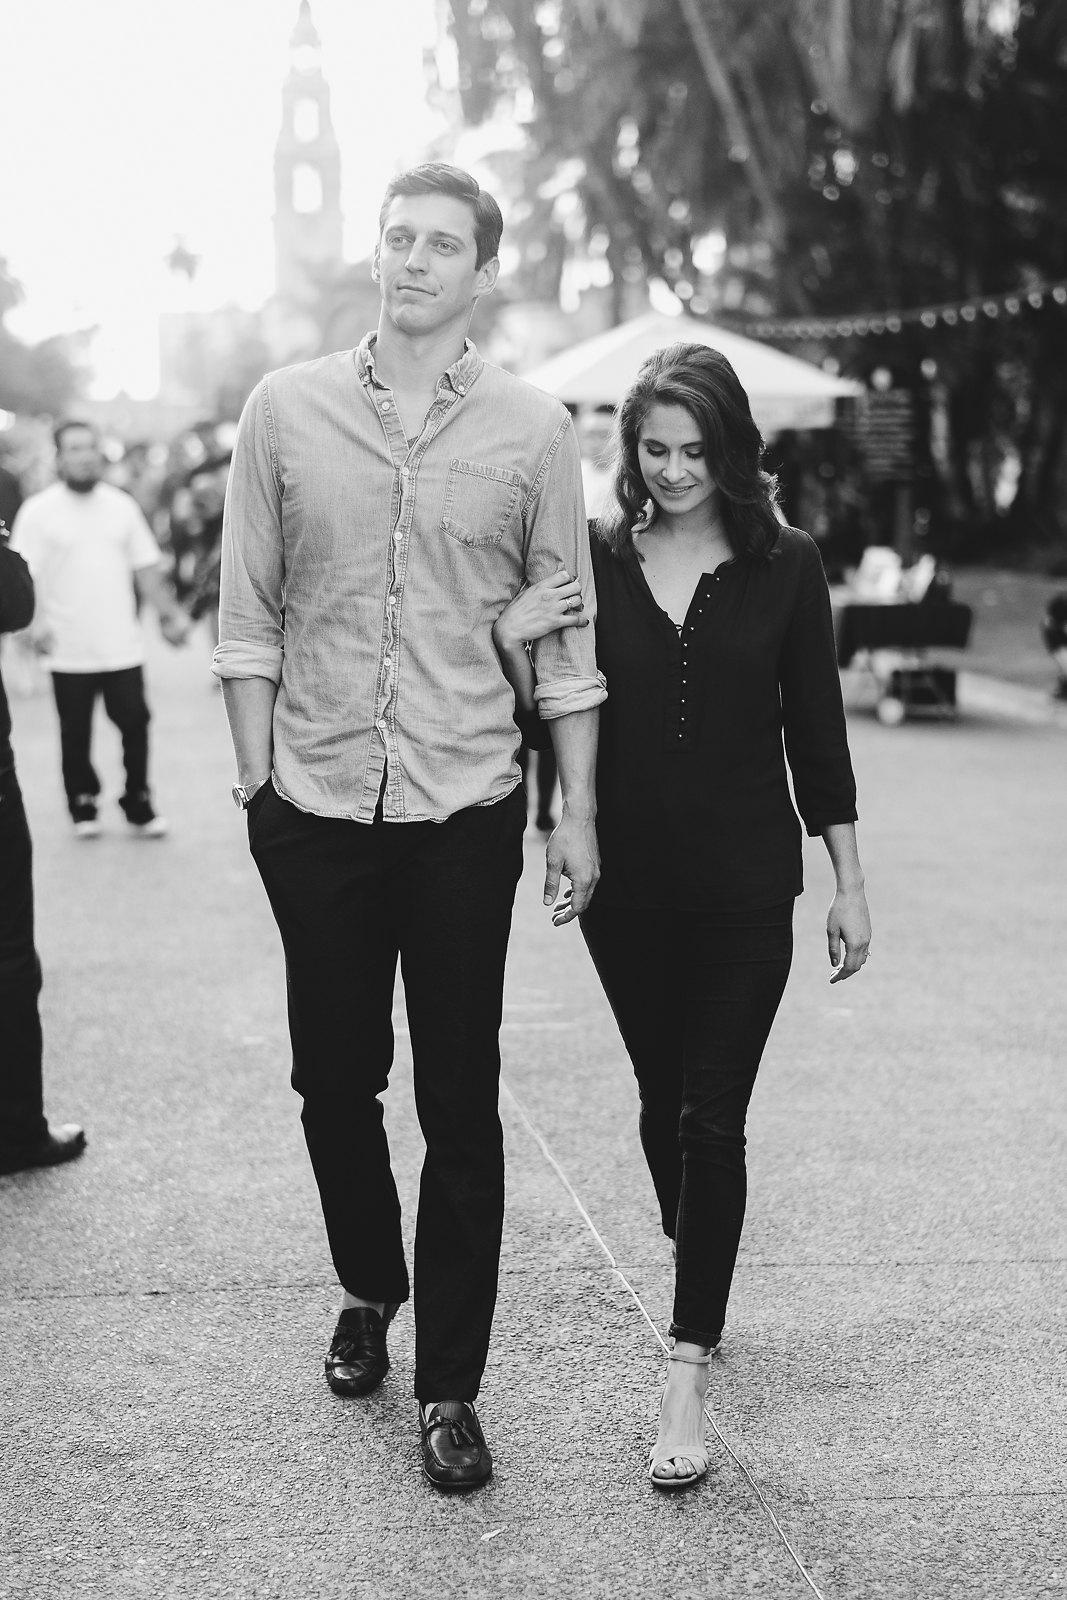 balboa-park-engagement-photos-11.jpg